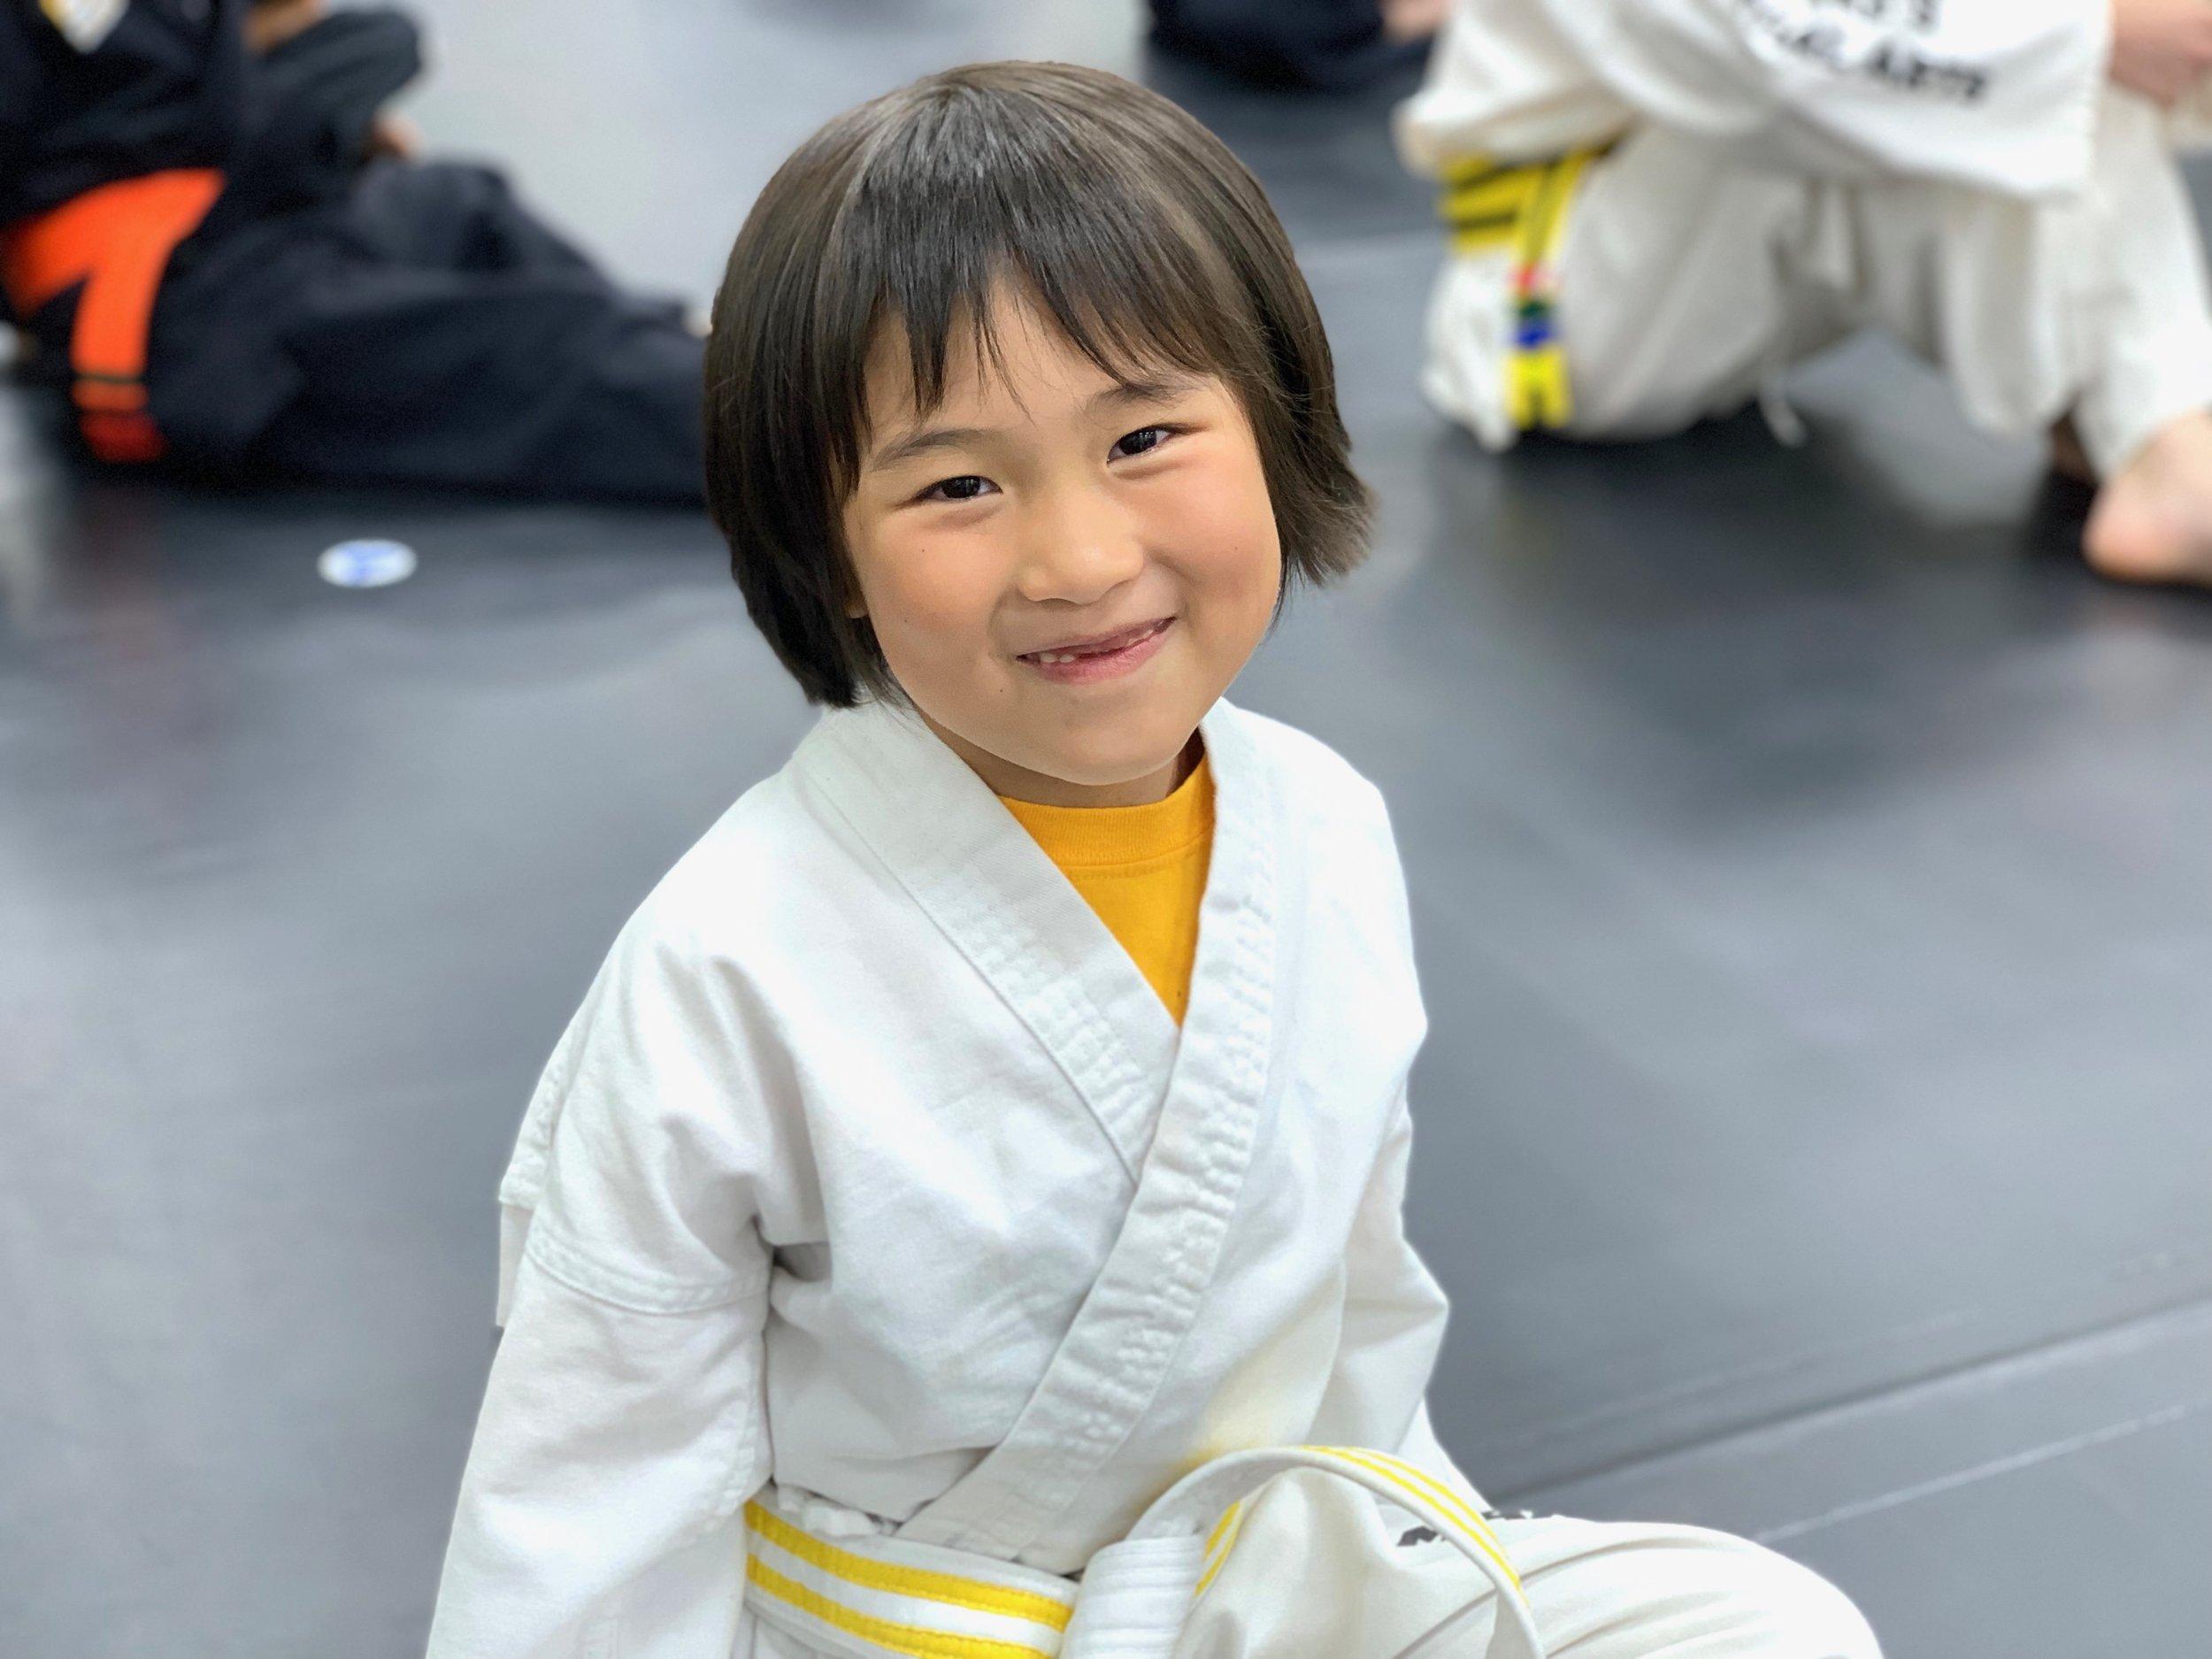 karate-kids-program-souhtlake-keller-grapevine-texas00046.jpeg